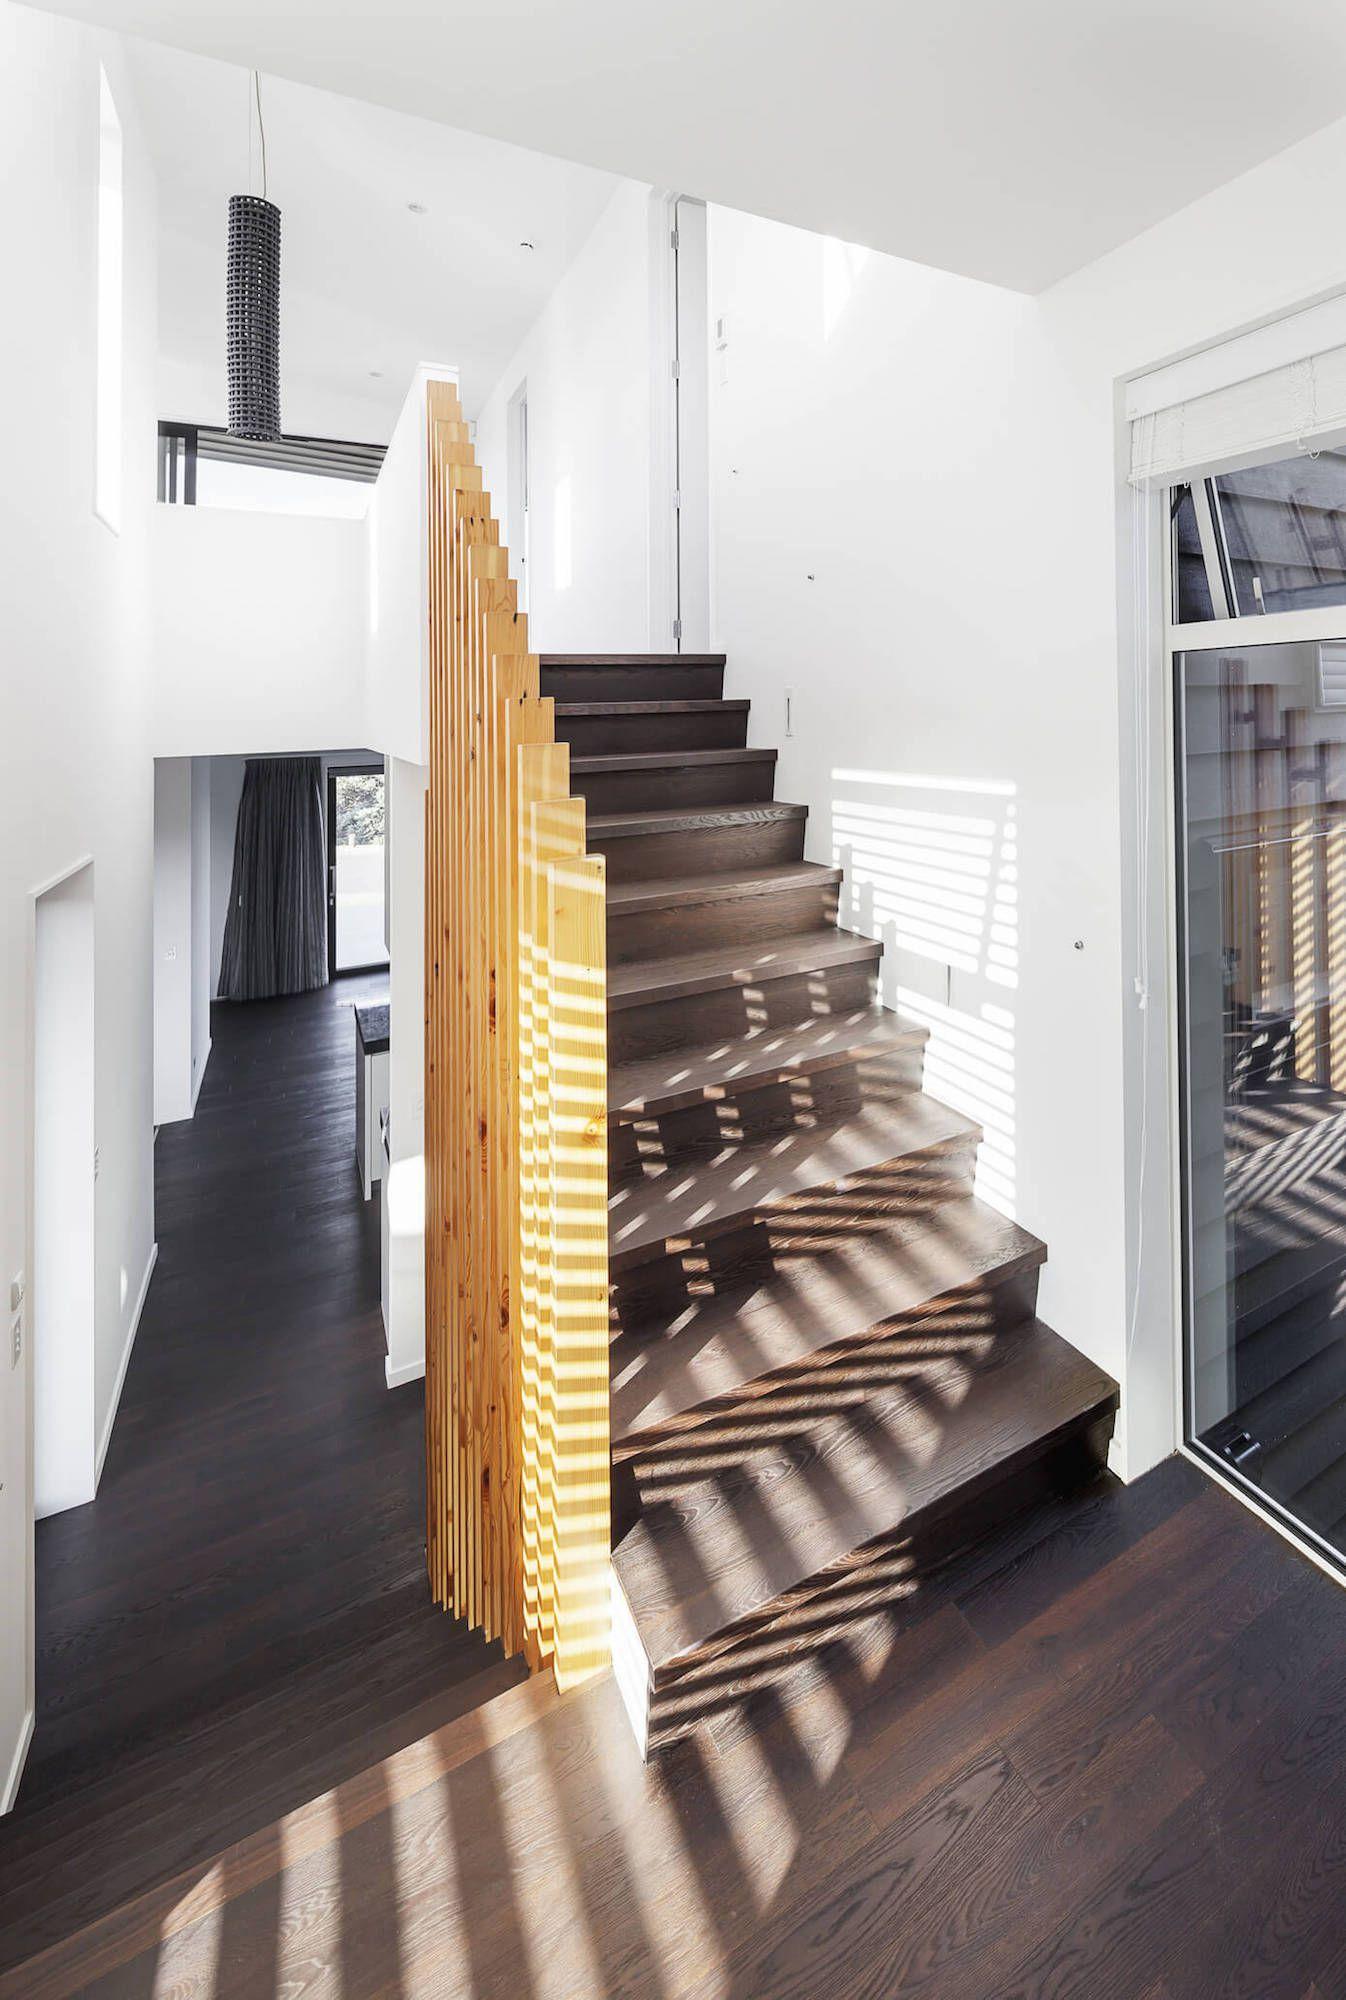 mclaren-house-archaus-architects-09